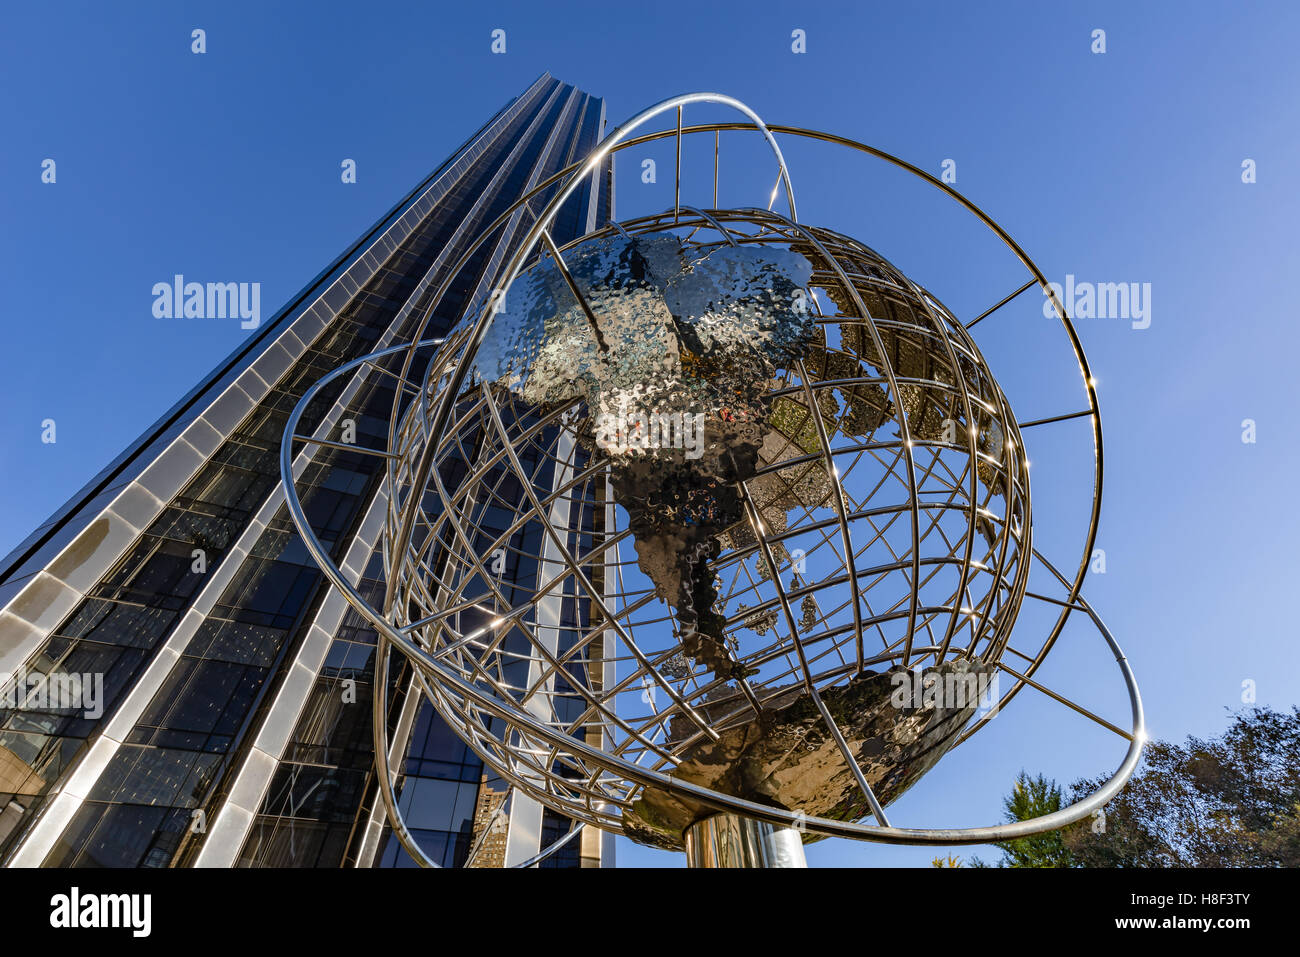 Trump International Hotel and Tower skyscraper with metal globe sculpture. Midtown, Manhattan, New York City Stock Photo